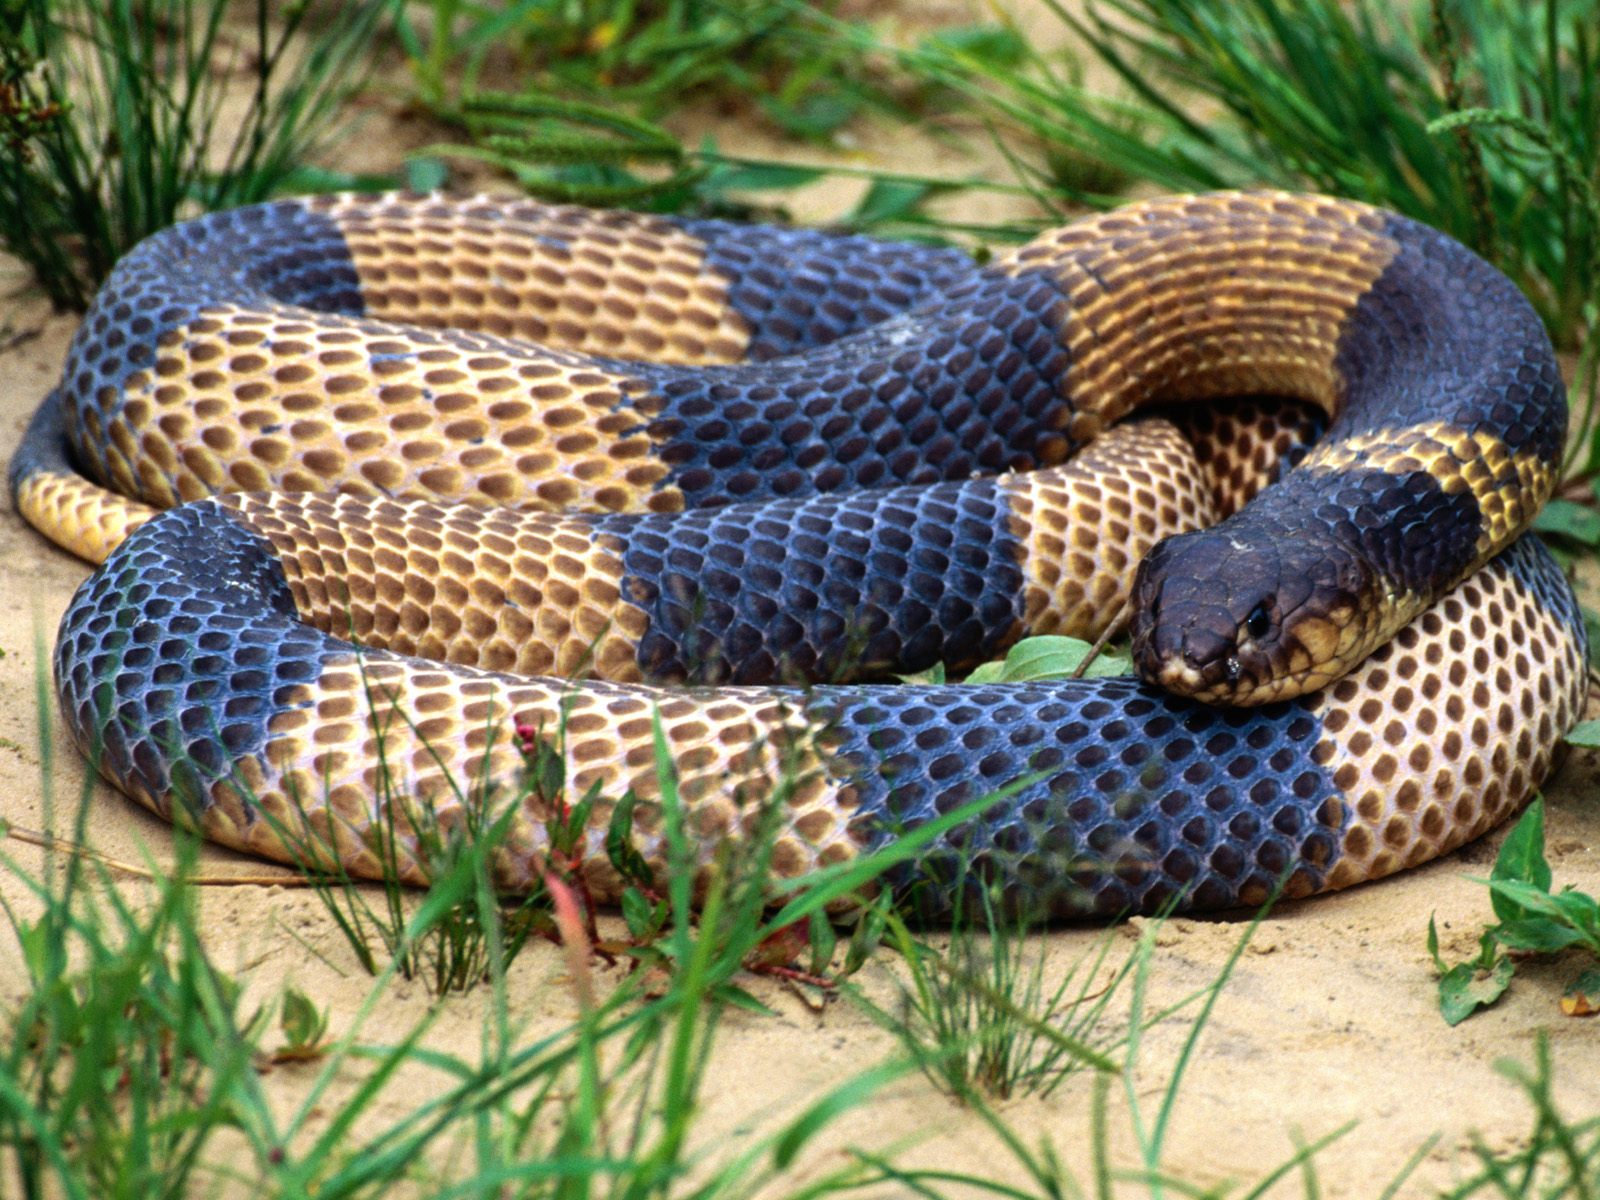 King Snake Hd Pictures Fantastic Snake Wallpaper: Dessins En Couleurs à Imprimer : Serpent, Numéro : 692843